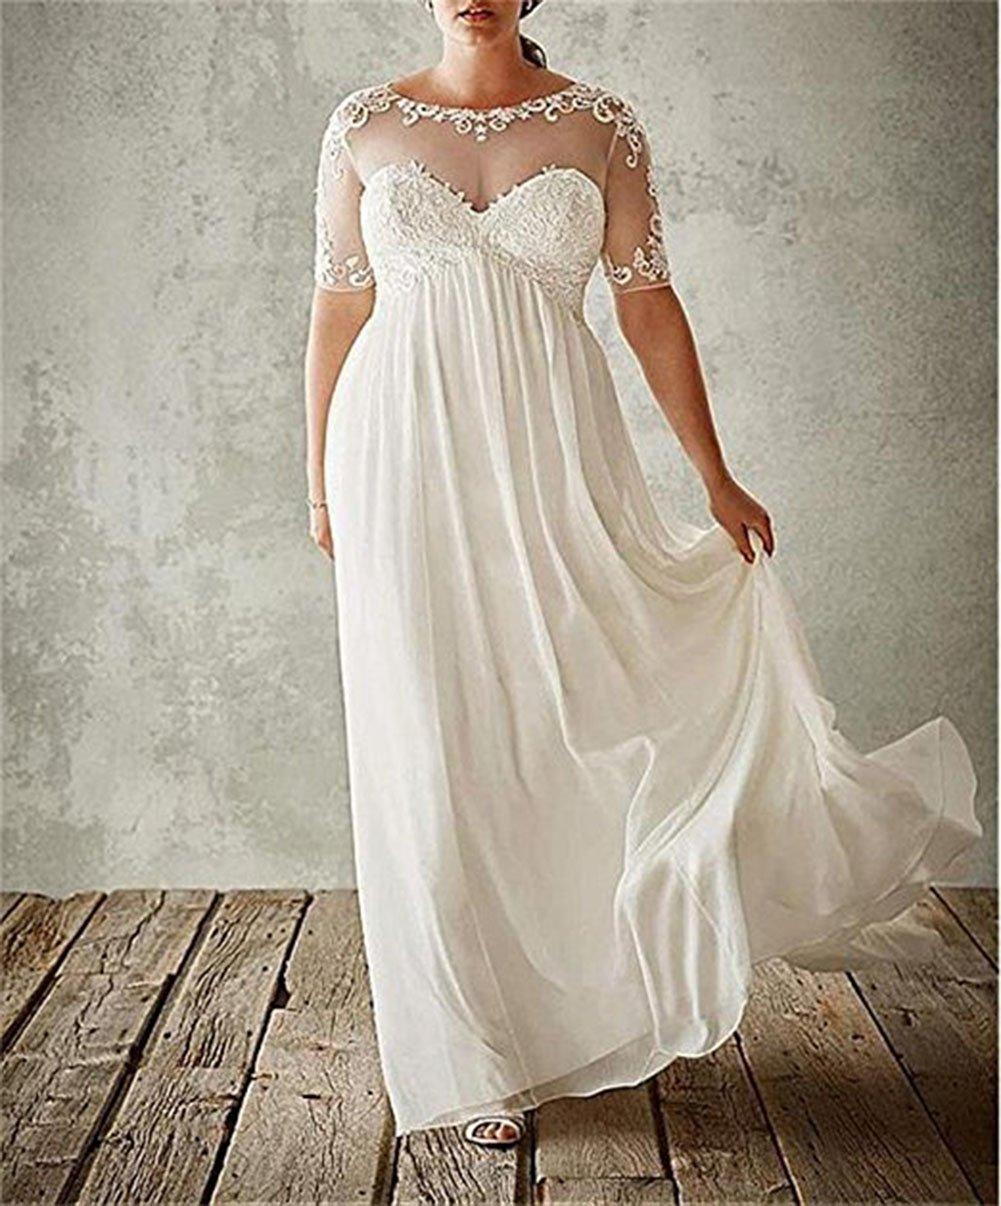 Ri Yun Women\'s Illusion Chiffon Wedding Dresses Plus Size For Bride Wedding  Dresses Bridal Gown 2018